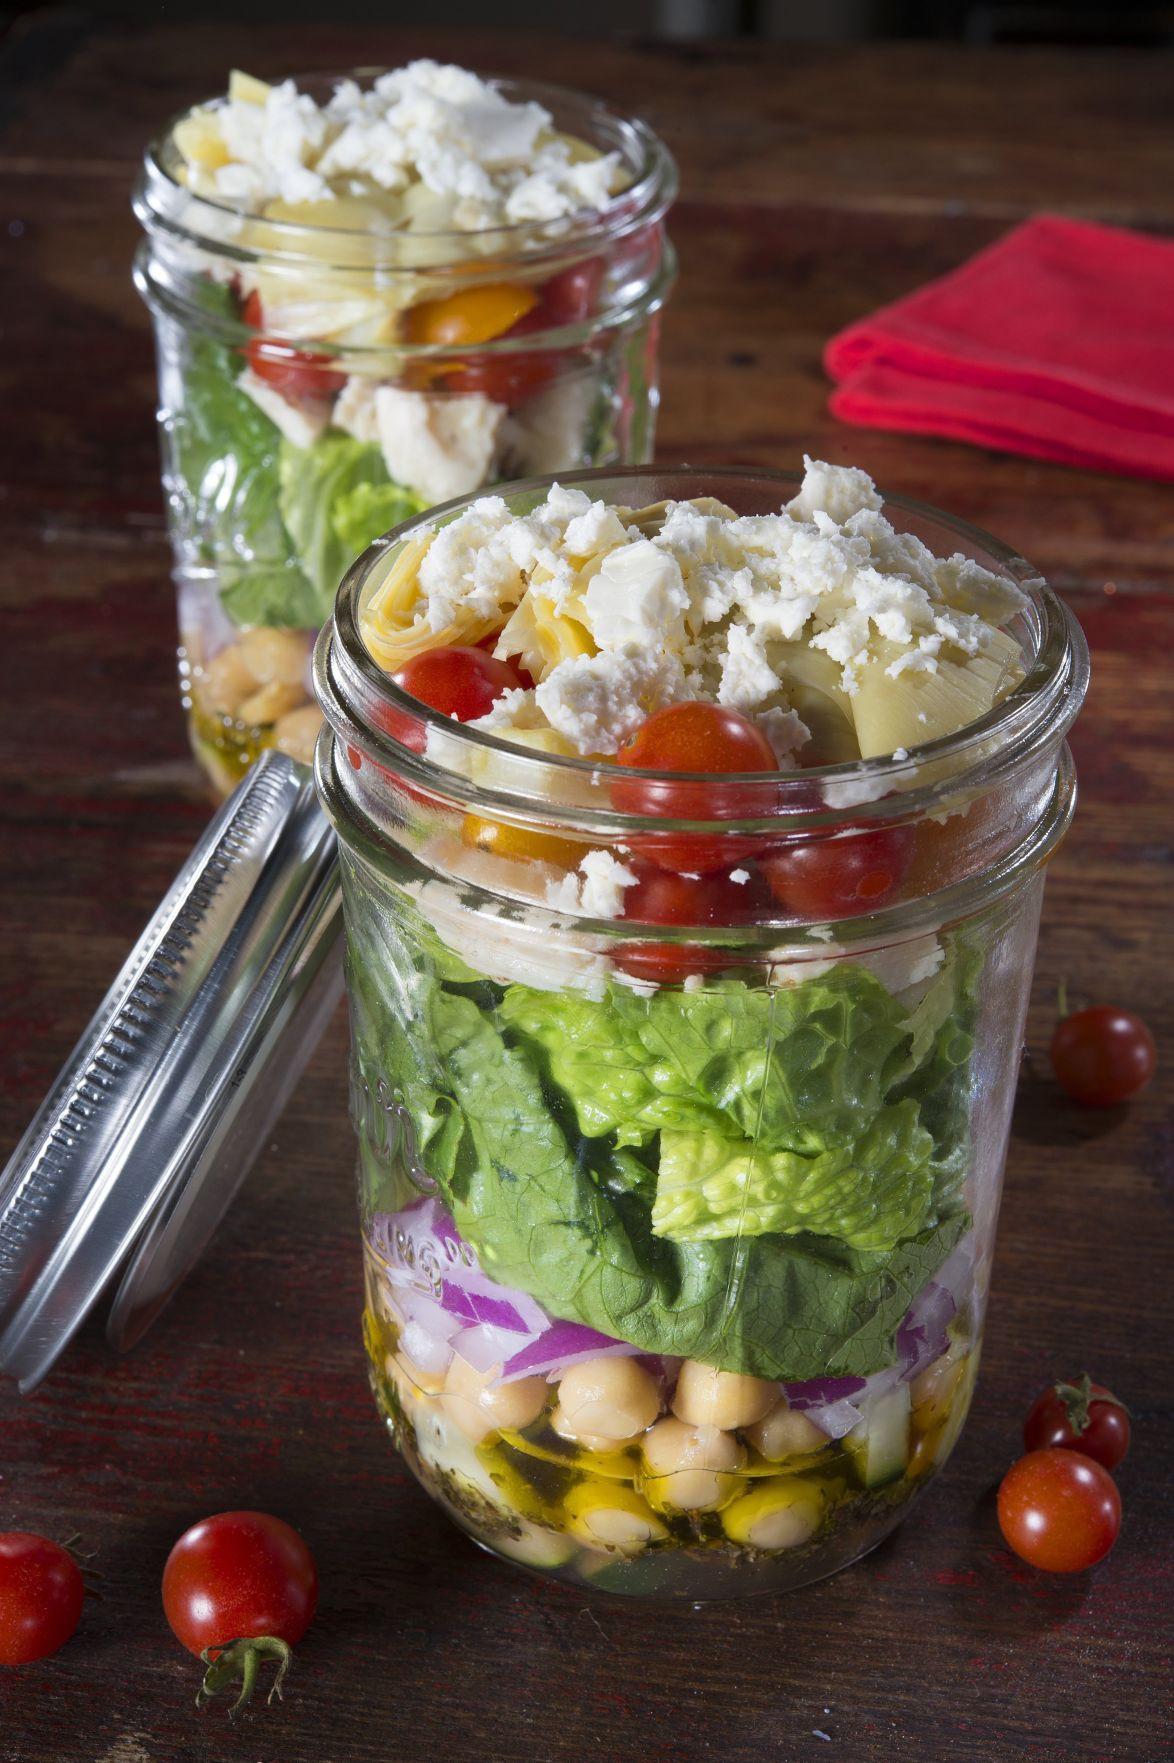 Healthy Mason Jar Lunches  Mason jar meals for on the go health